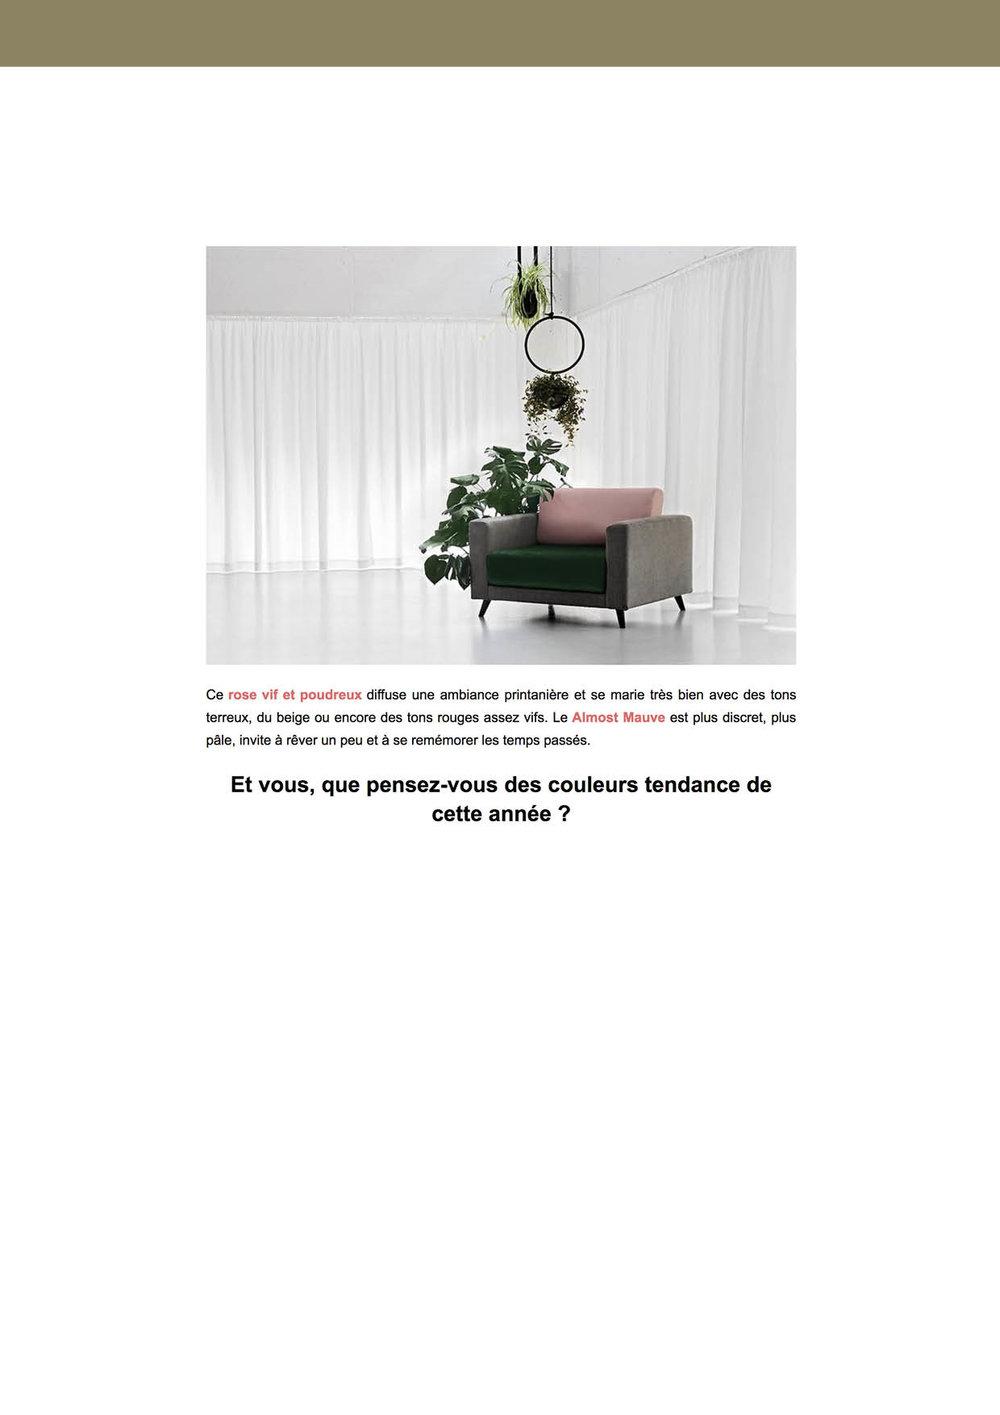 BOOKMEDIA_MAR23.jpg